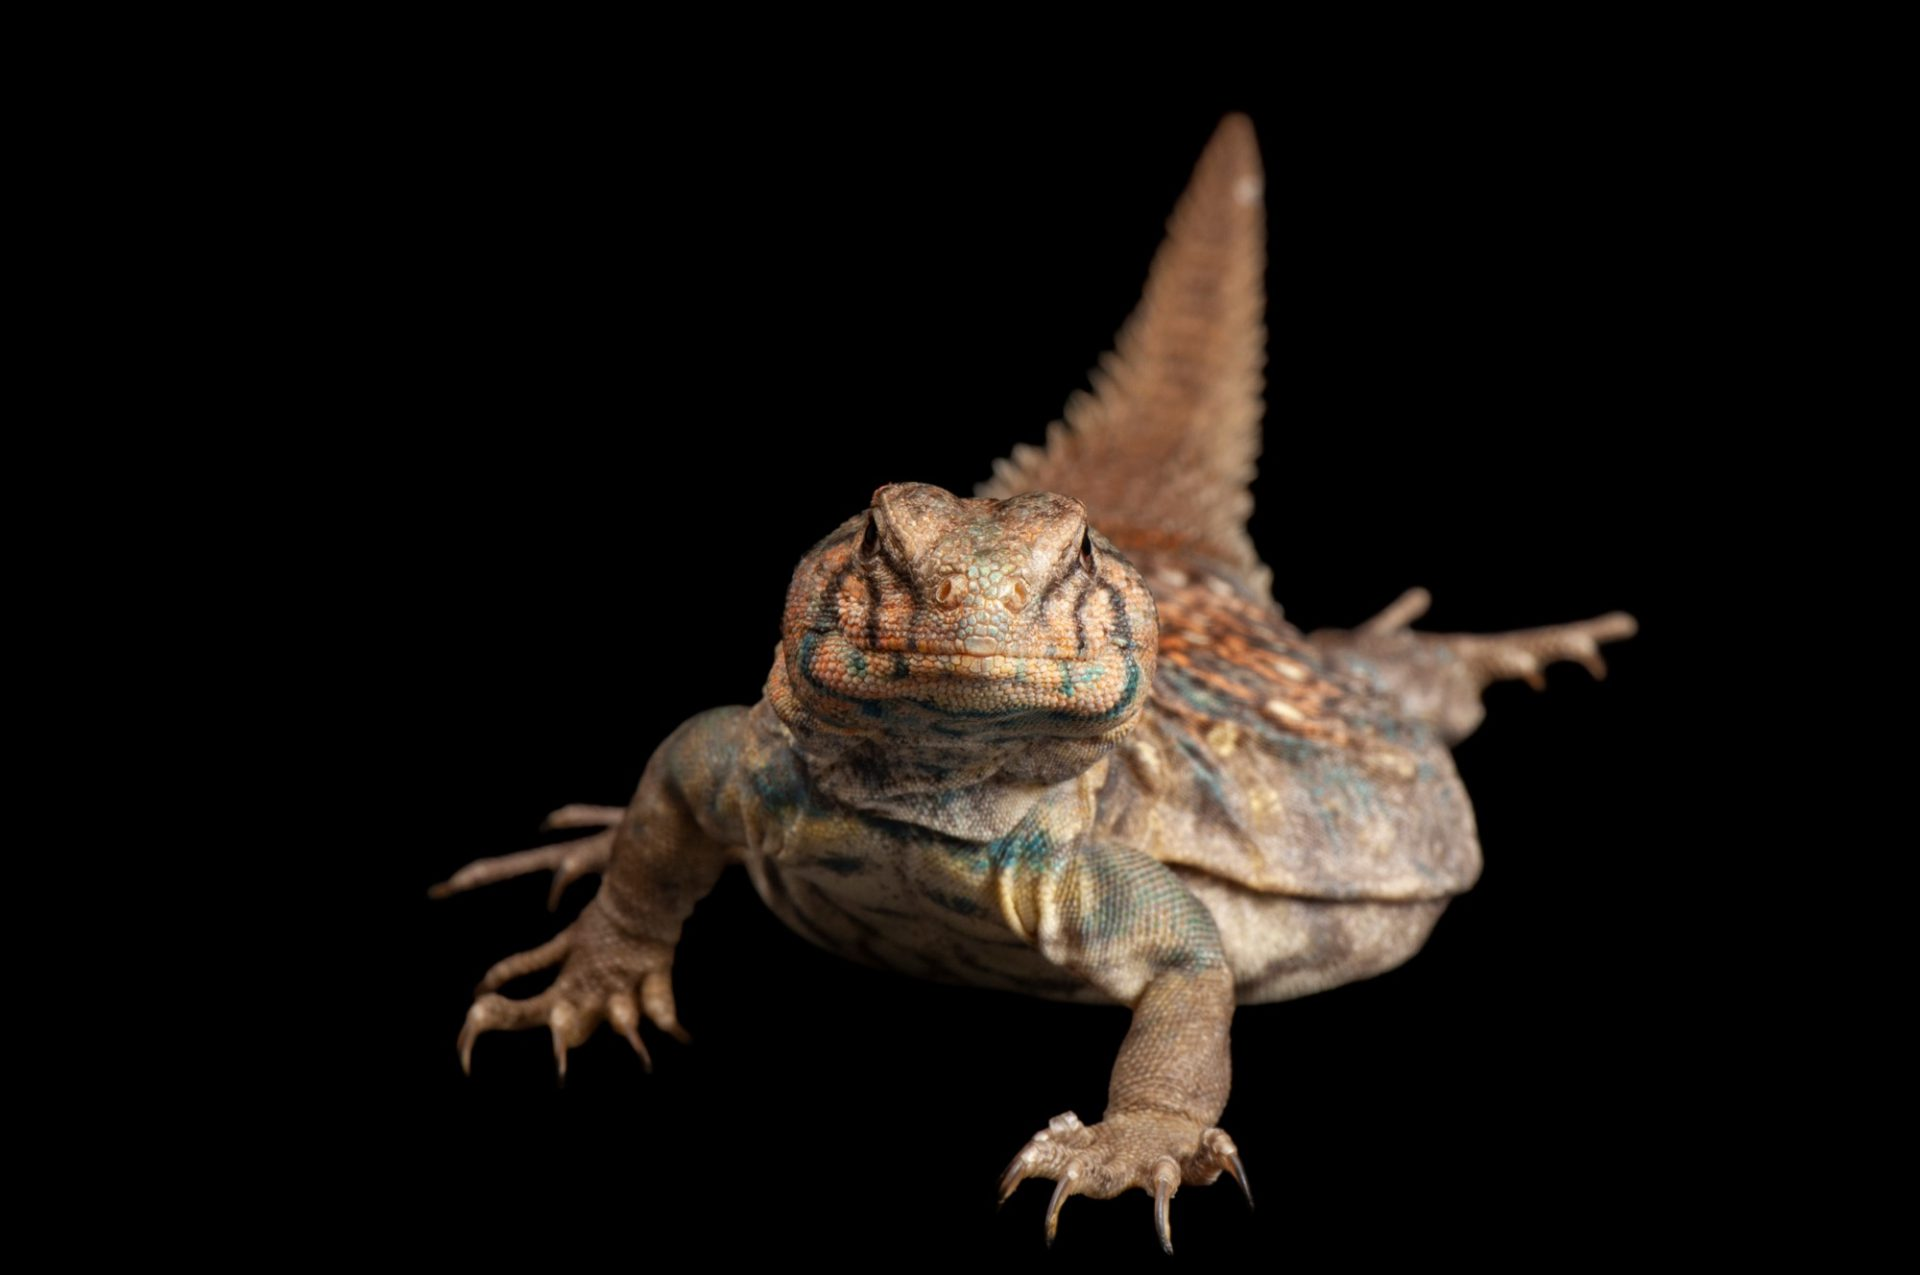 An ocellated uromastyx lizard (Saara hardwickii) at the Denver Zoo.